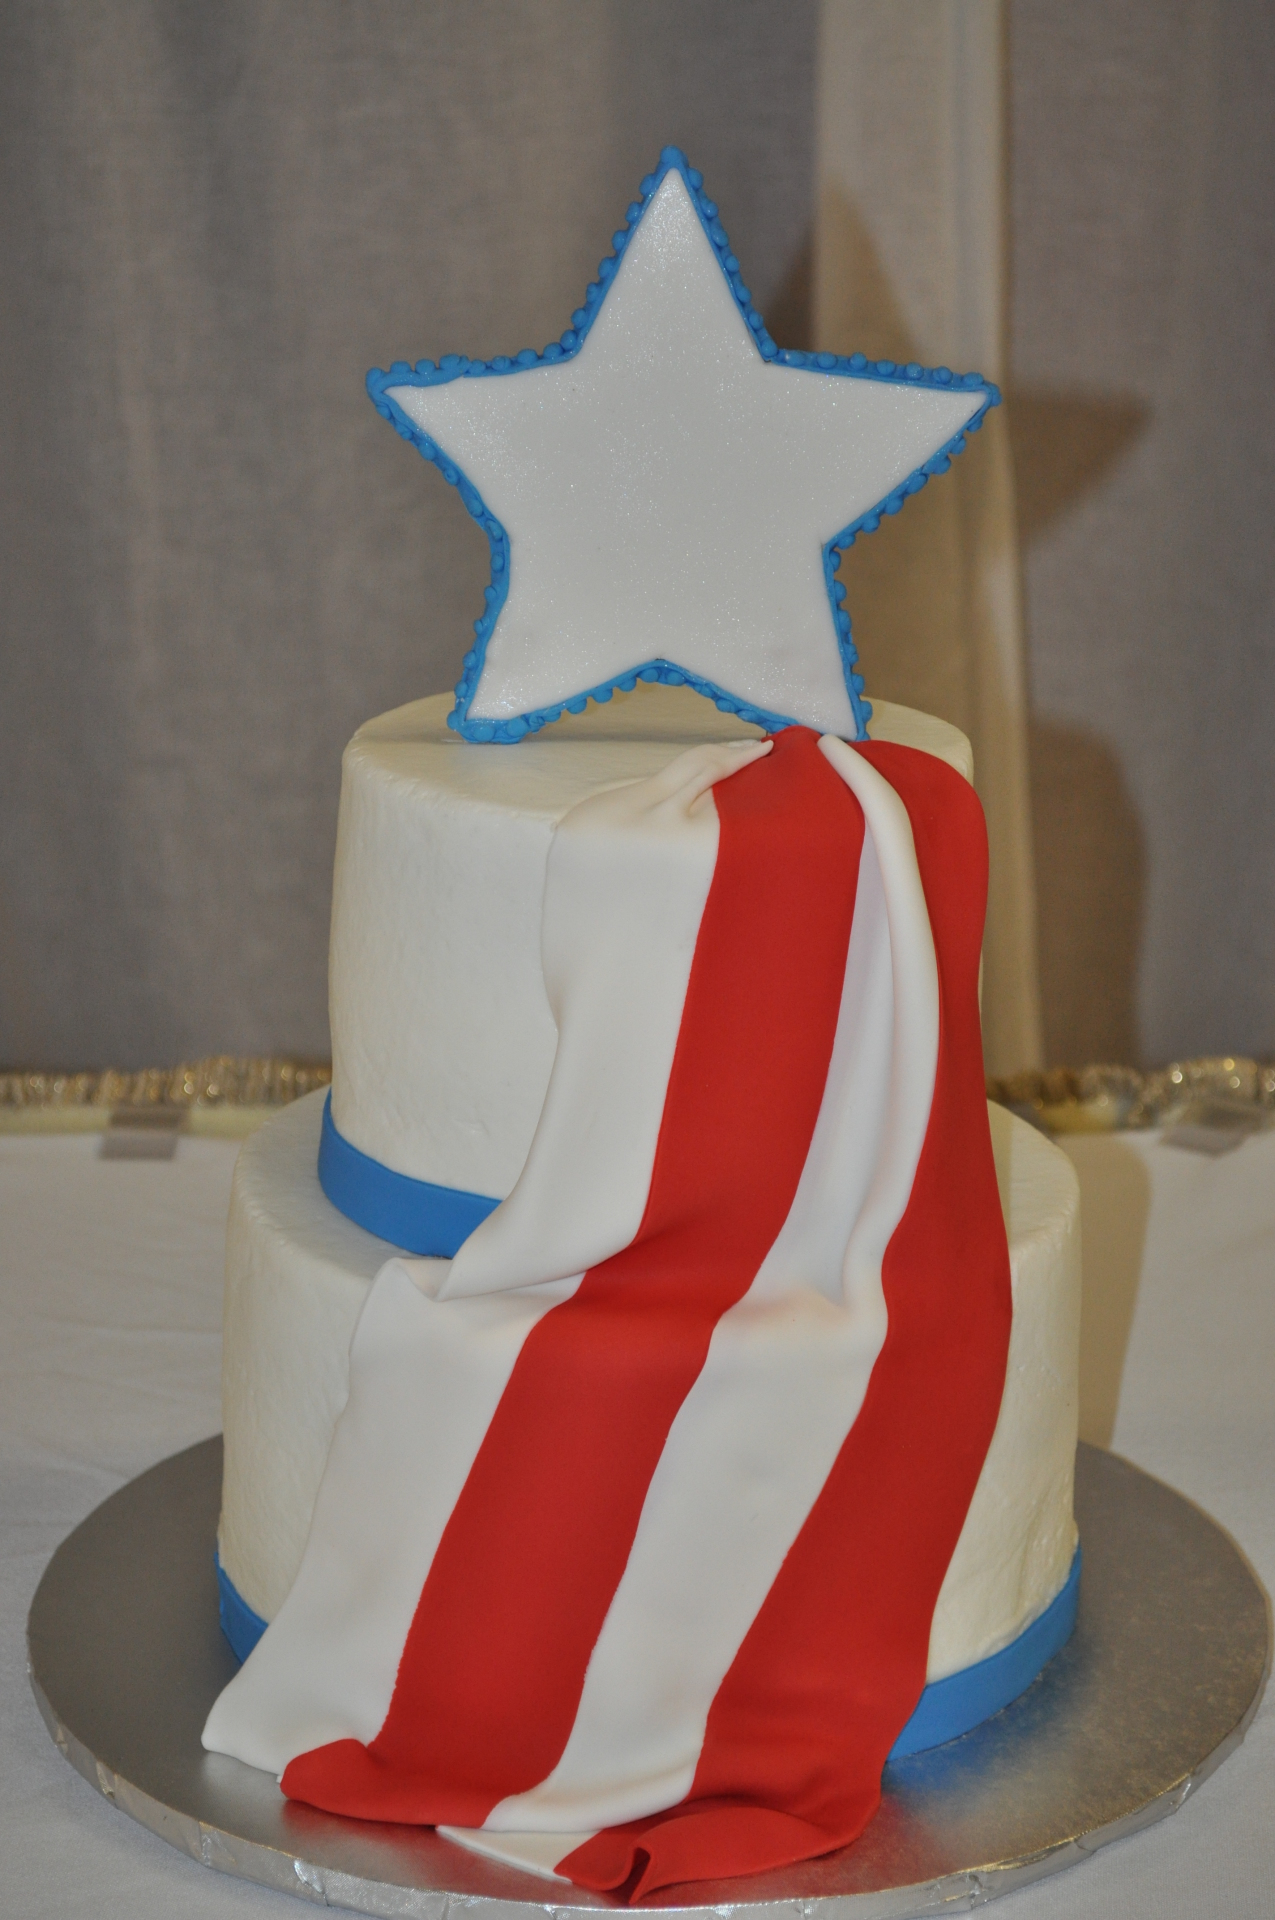 American flag drape cake,groom's cake,patriotic cake